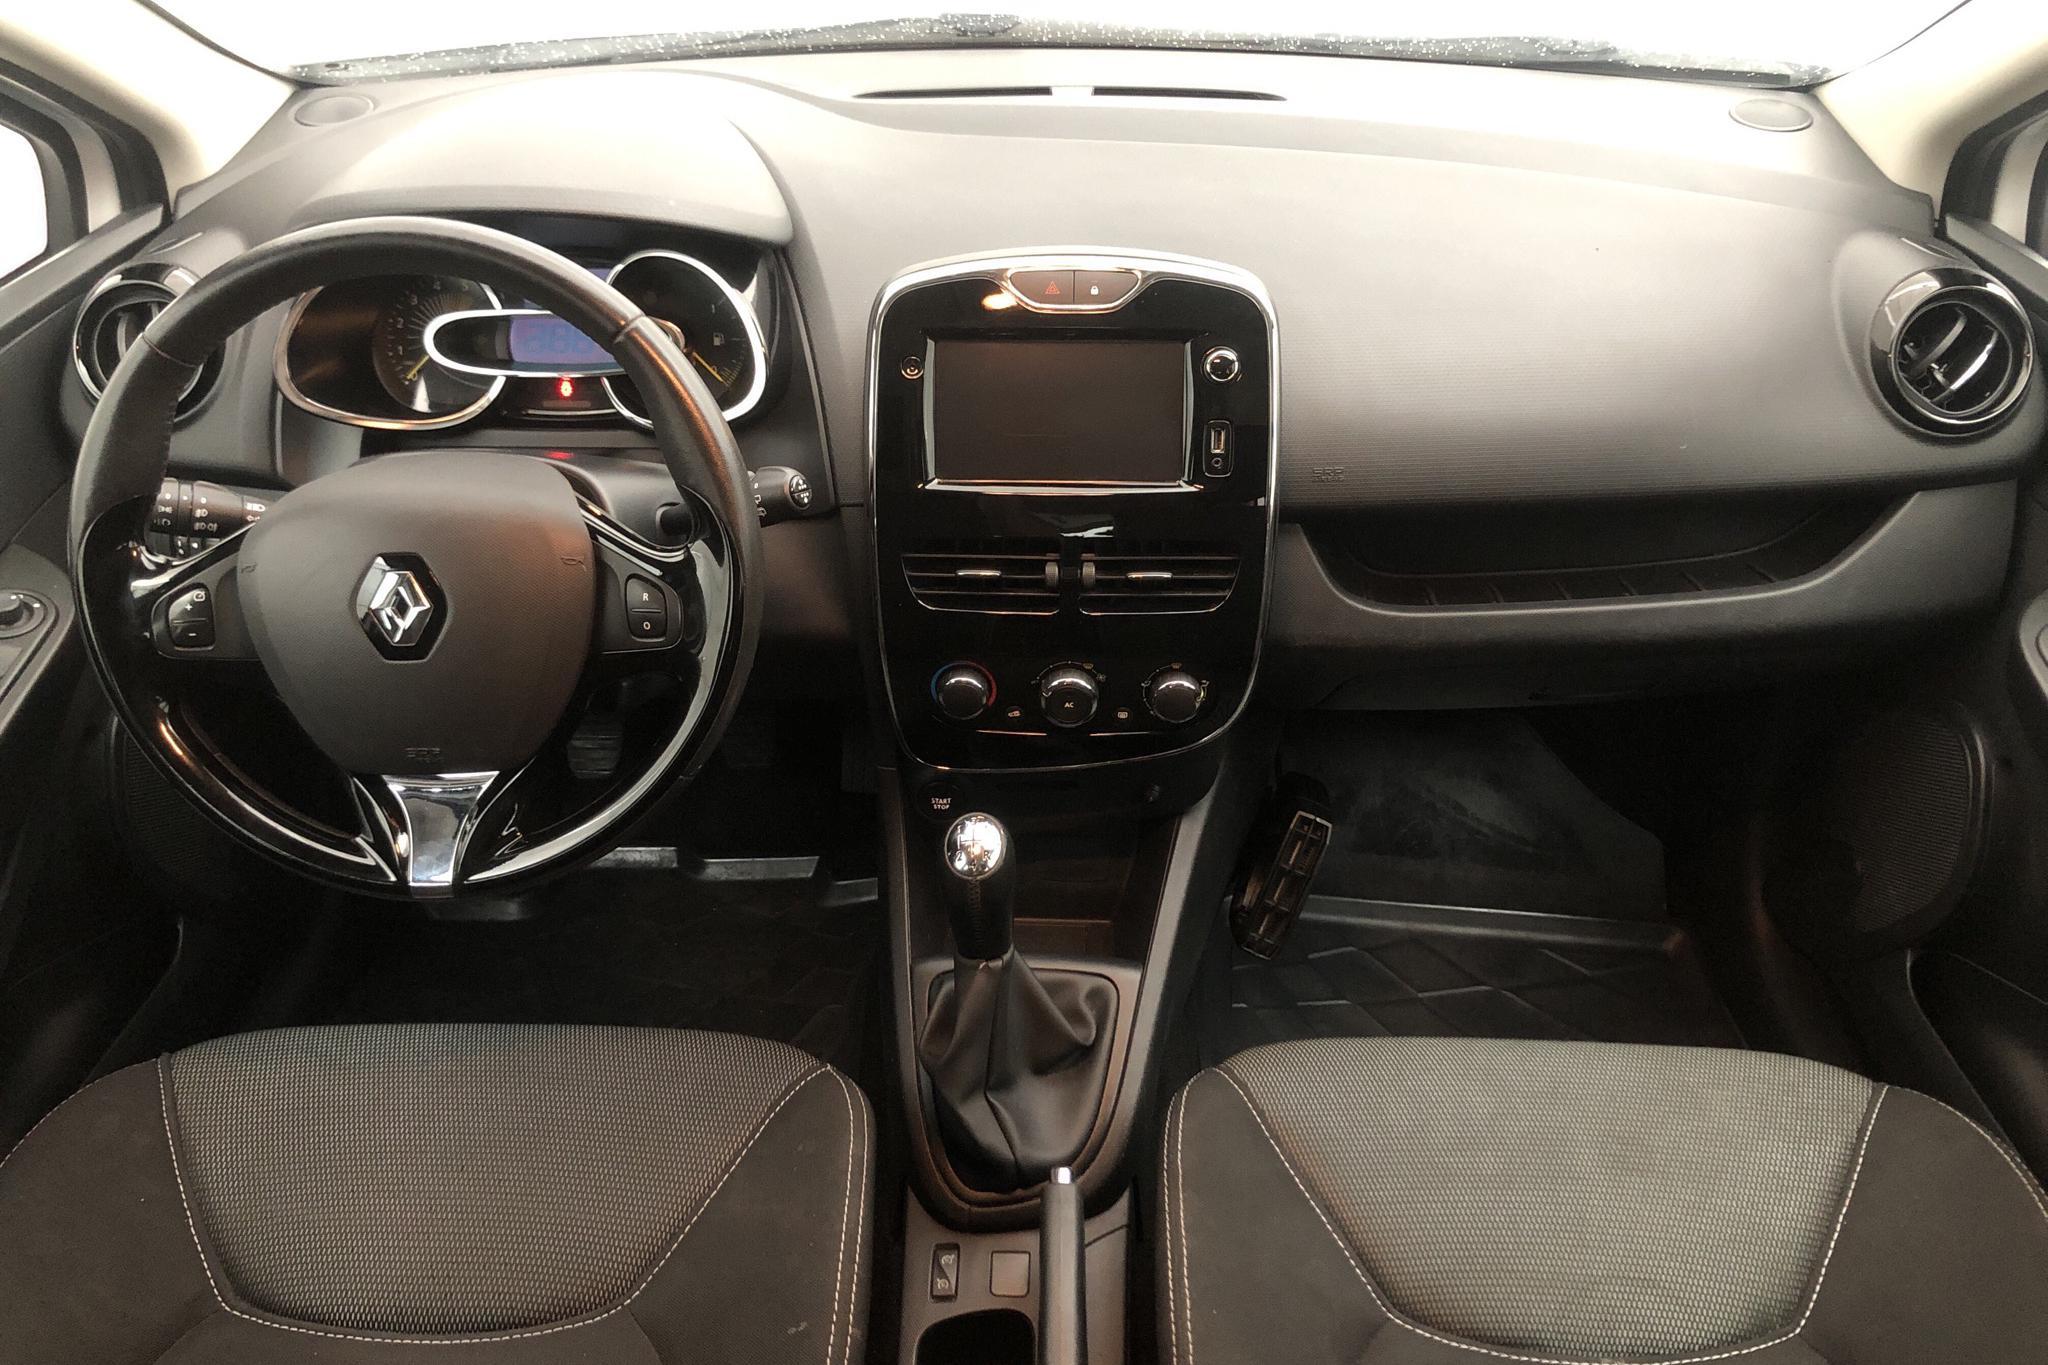 Renault Clio IV 1.5 dCi Sports Tourer (90hk) - 13 083 mil - Manuell - vit - 2014